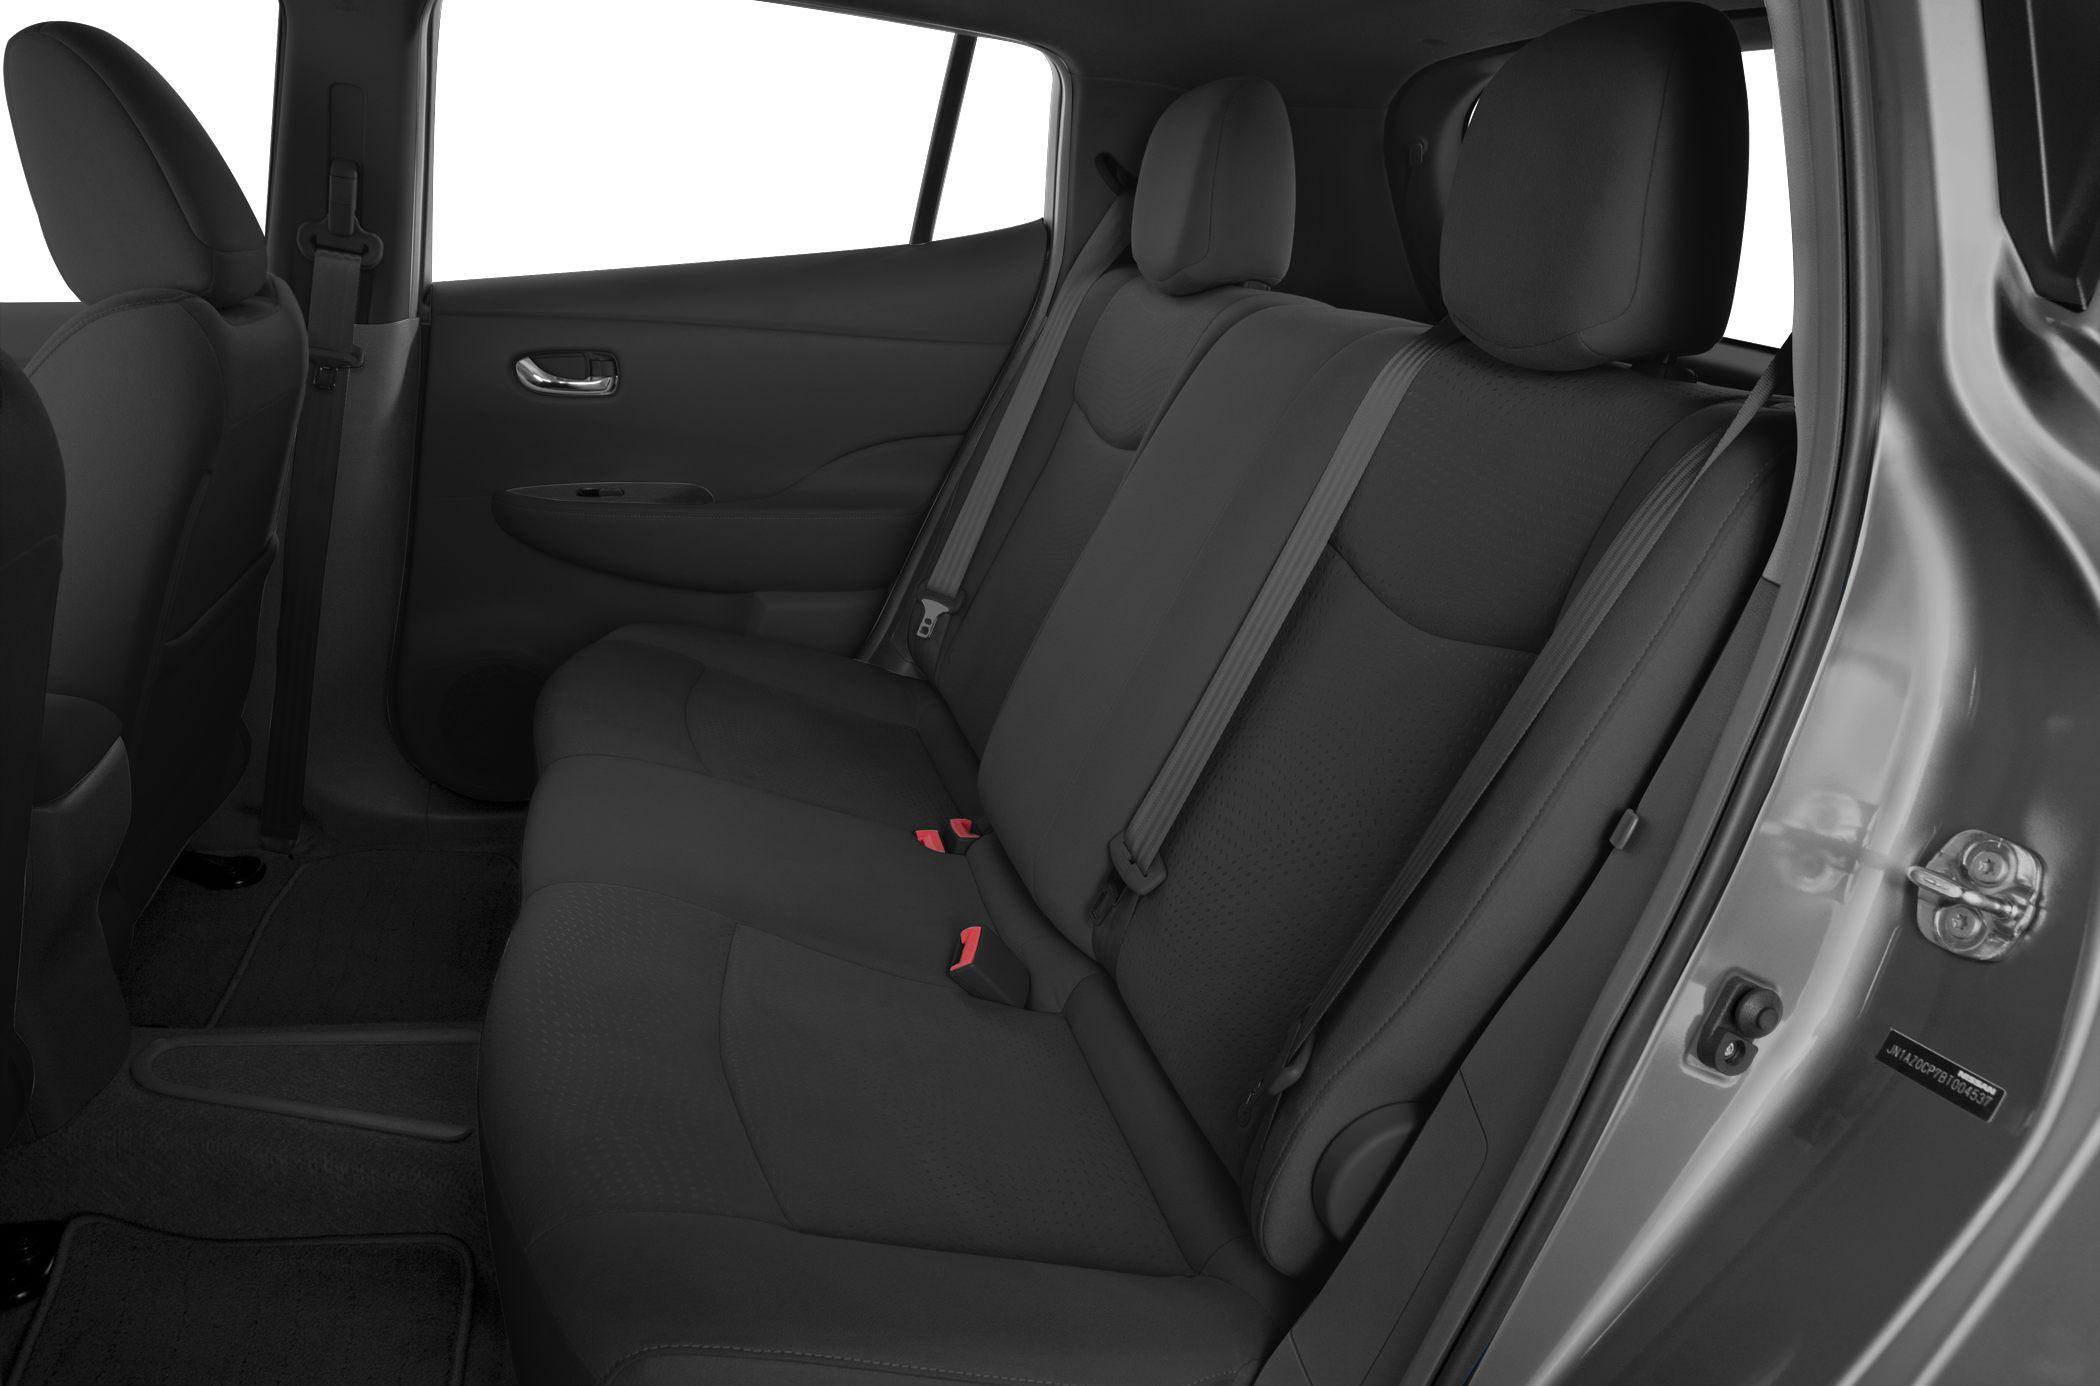 2016 nissan leaf styles features highlights. Black Bedroom Furniture Sets. Home Design Ideas